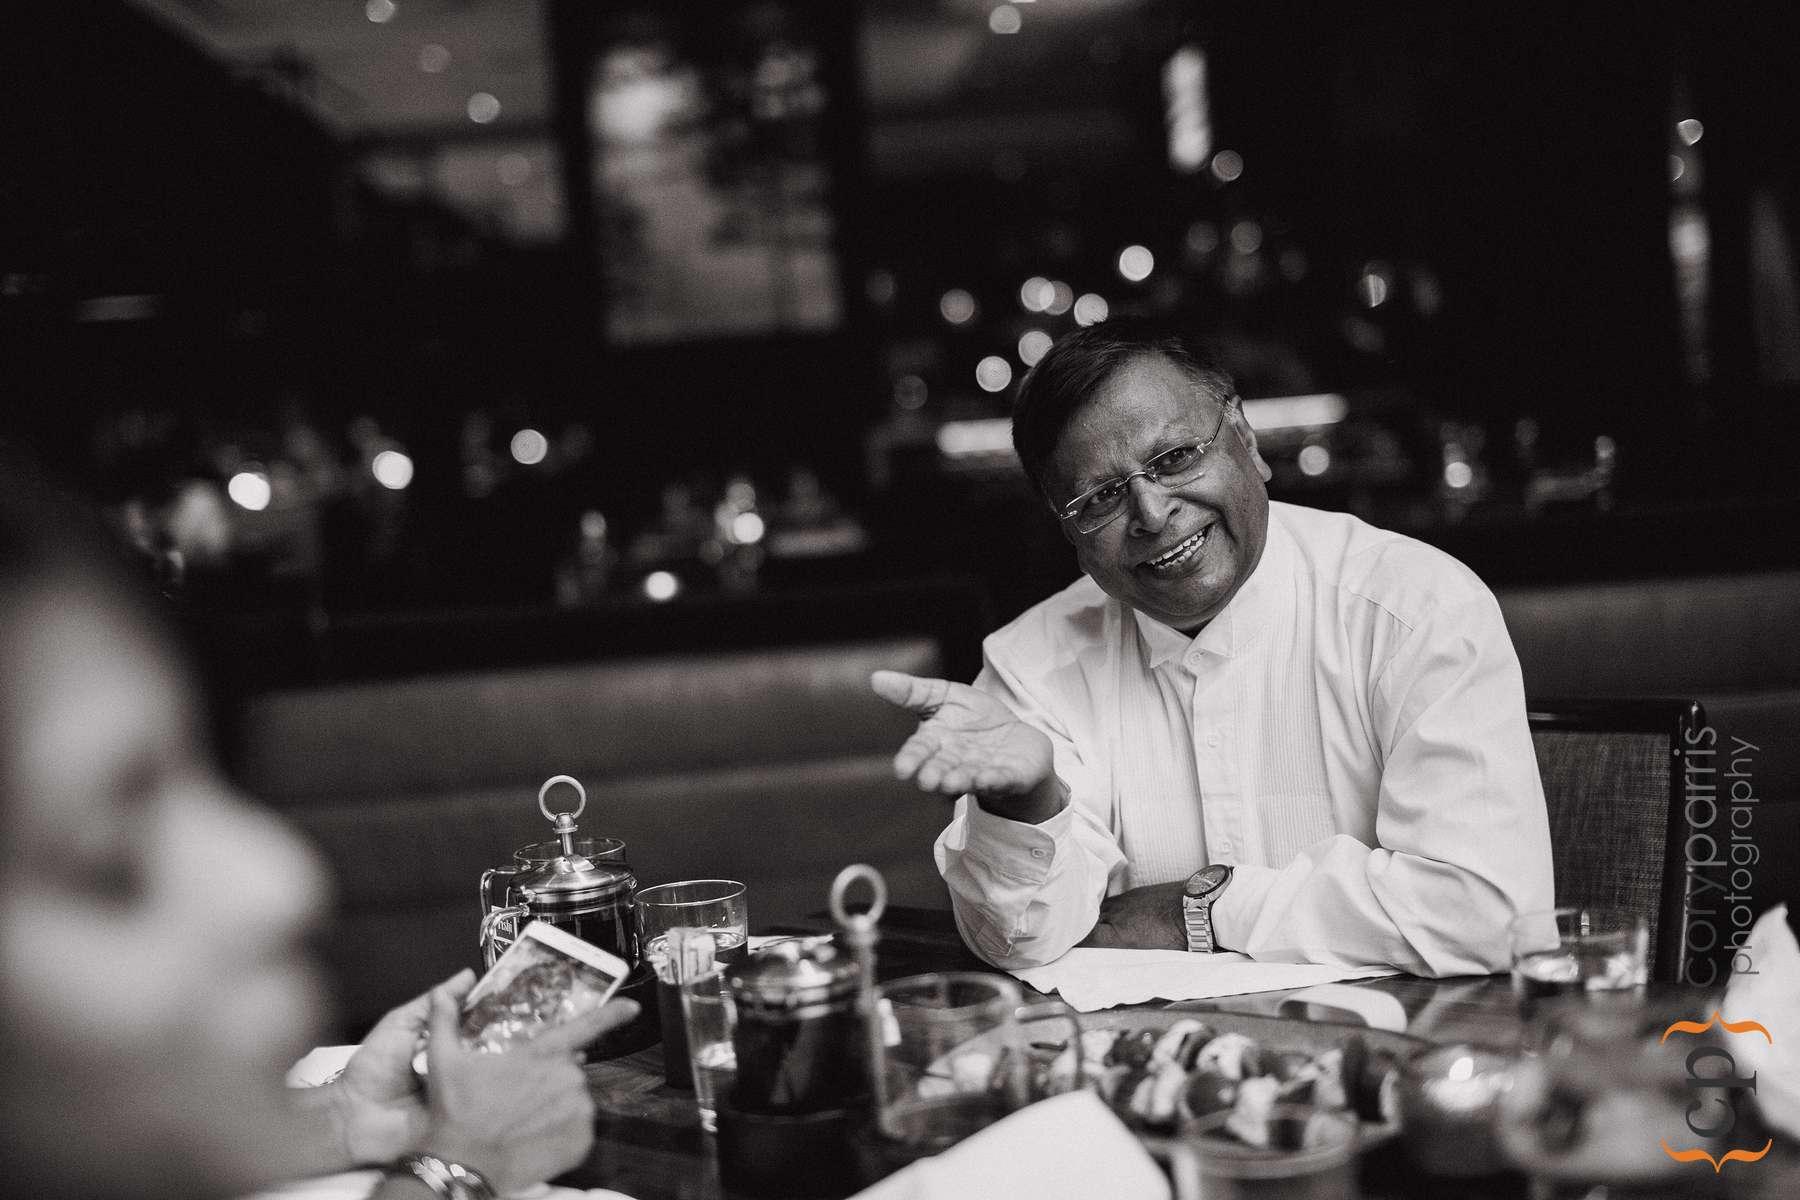 Farah's dad laughing during dinner.